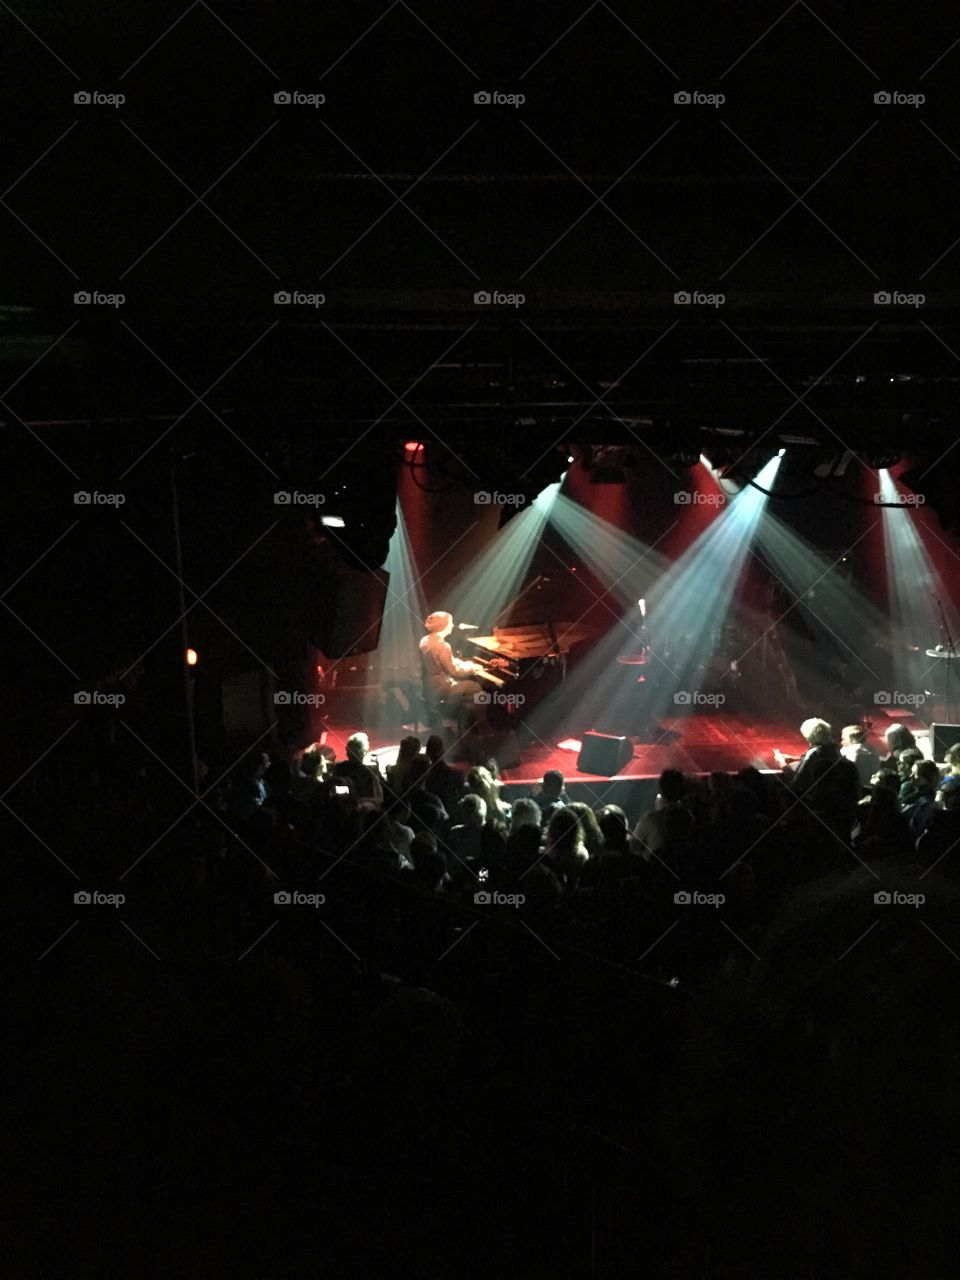 Concert De Melkweg Amsterdam